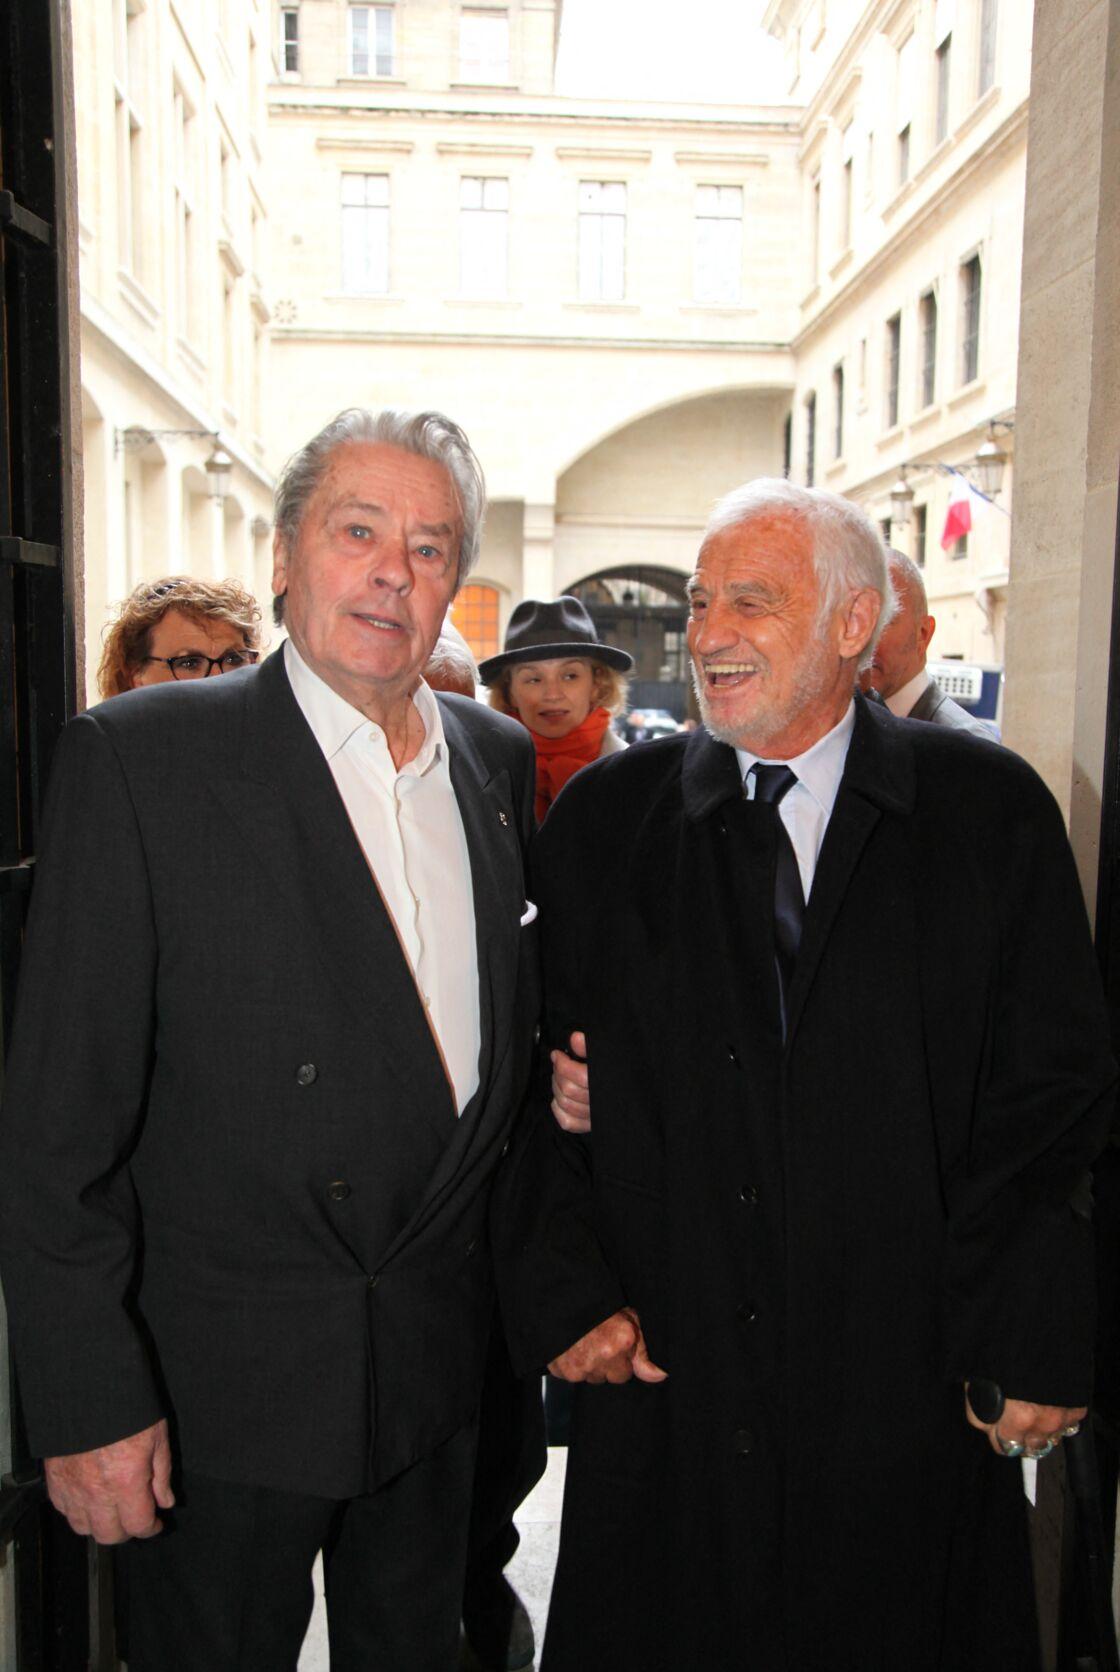 Alain Delon et Jean-Paul Belmondo en novembre 2016.